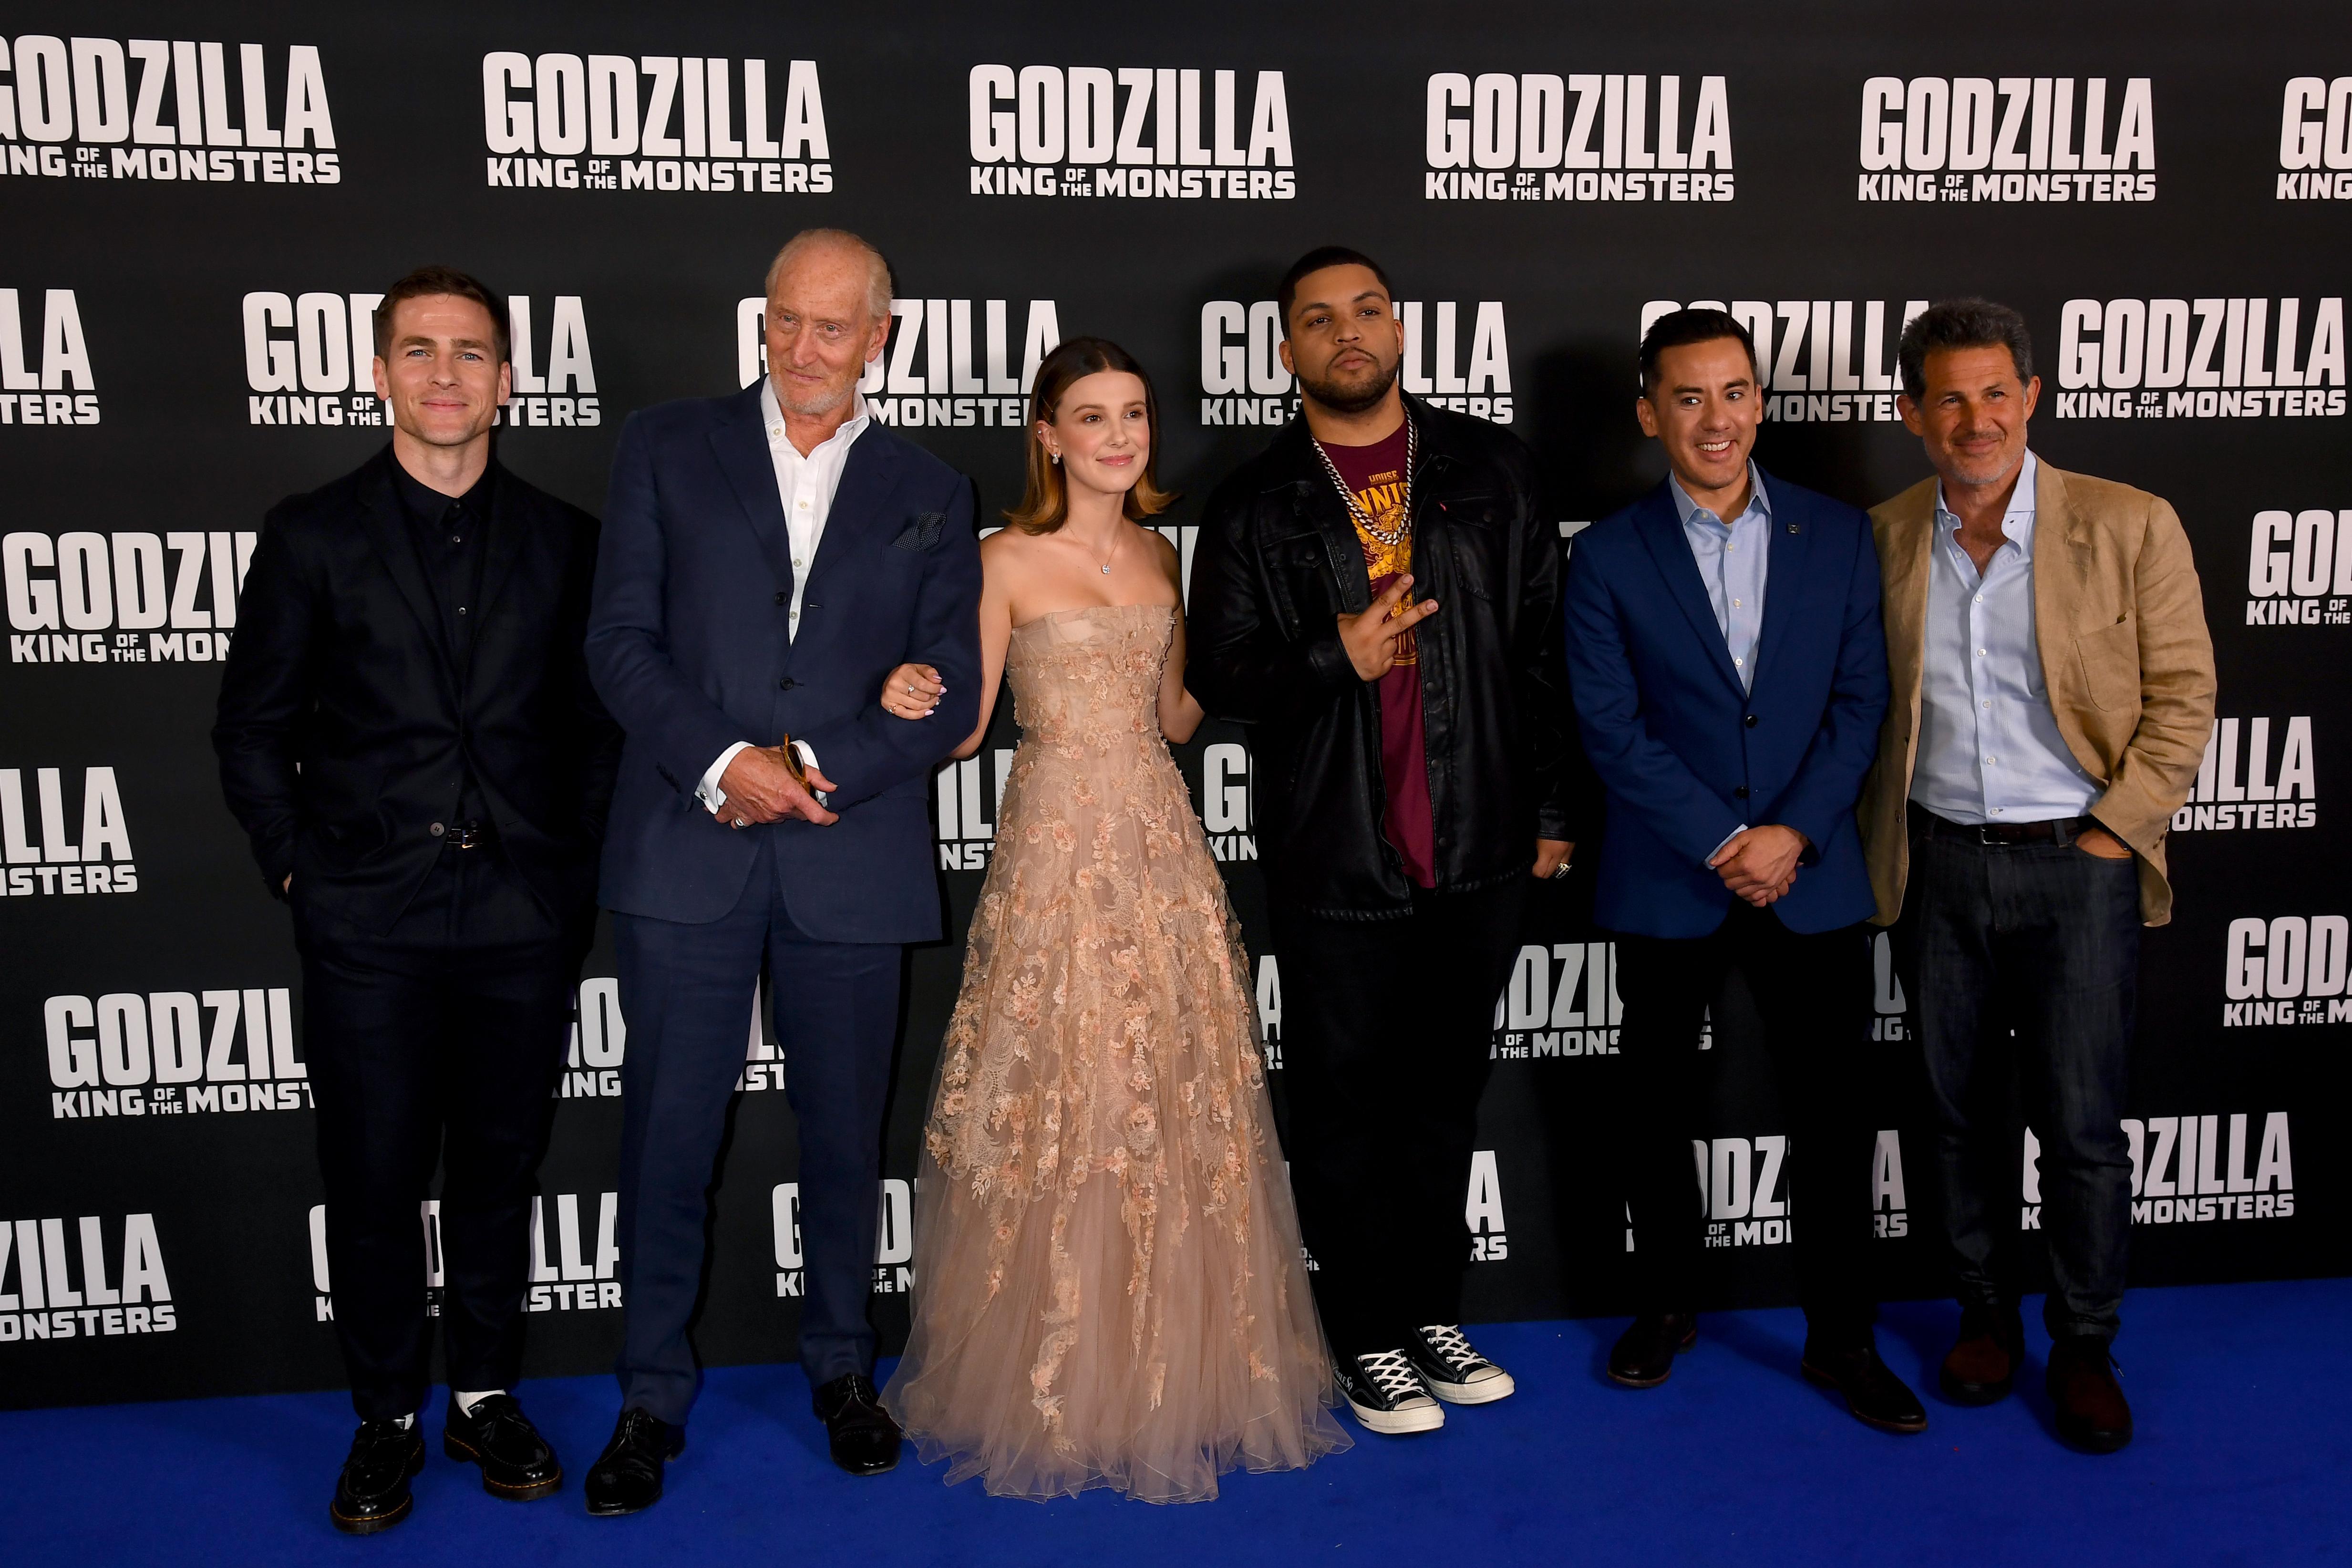 Cast Of Godzilla Attends Movie Premier